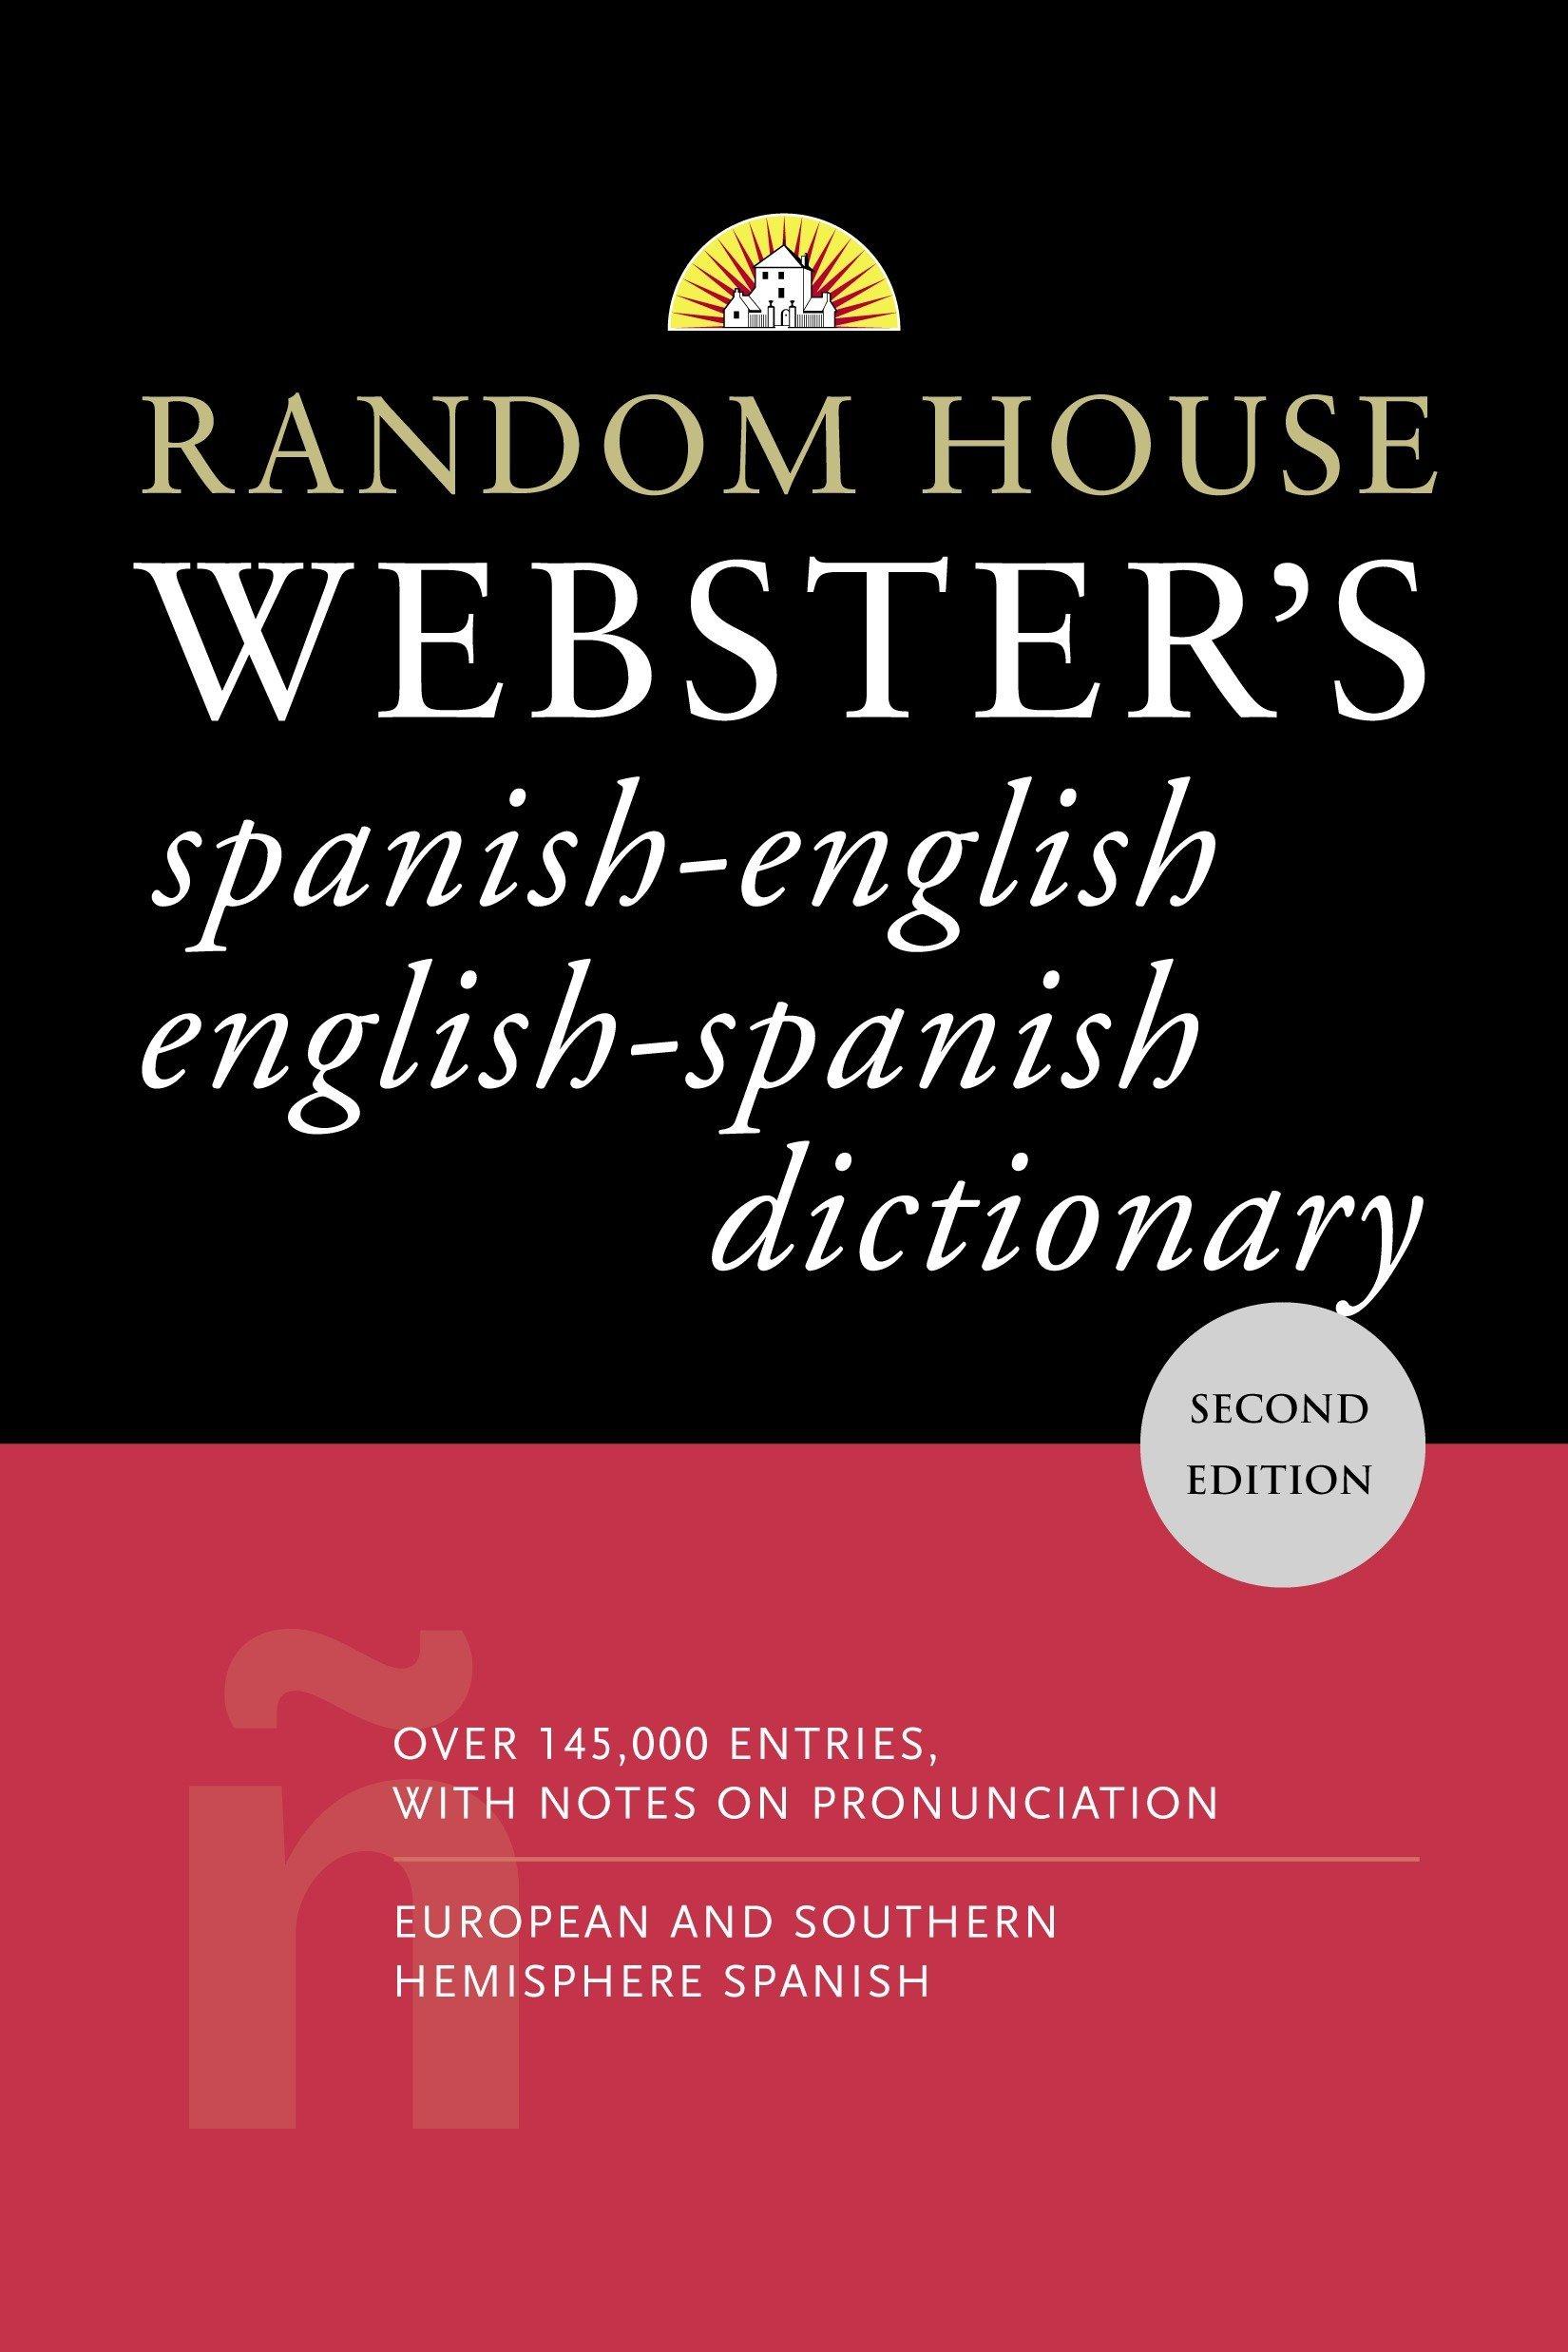 Random House Webster's Spanish-English English-Spanish Dictionary